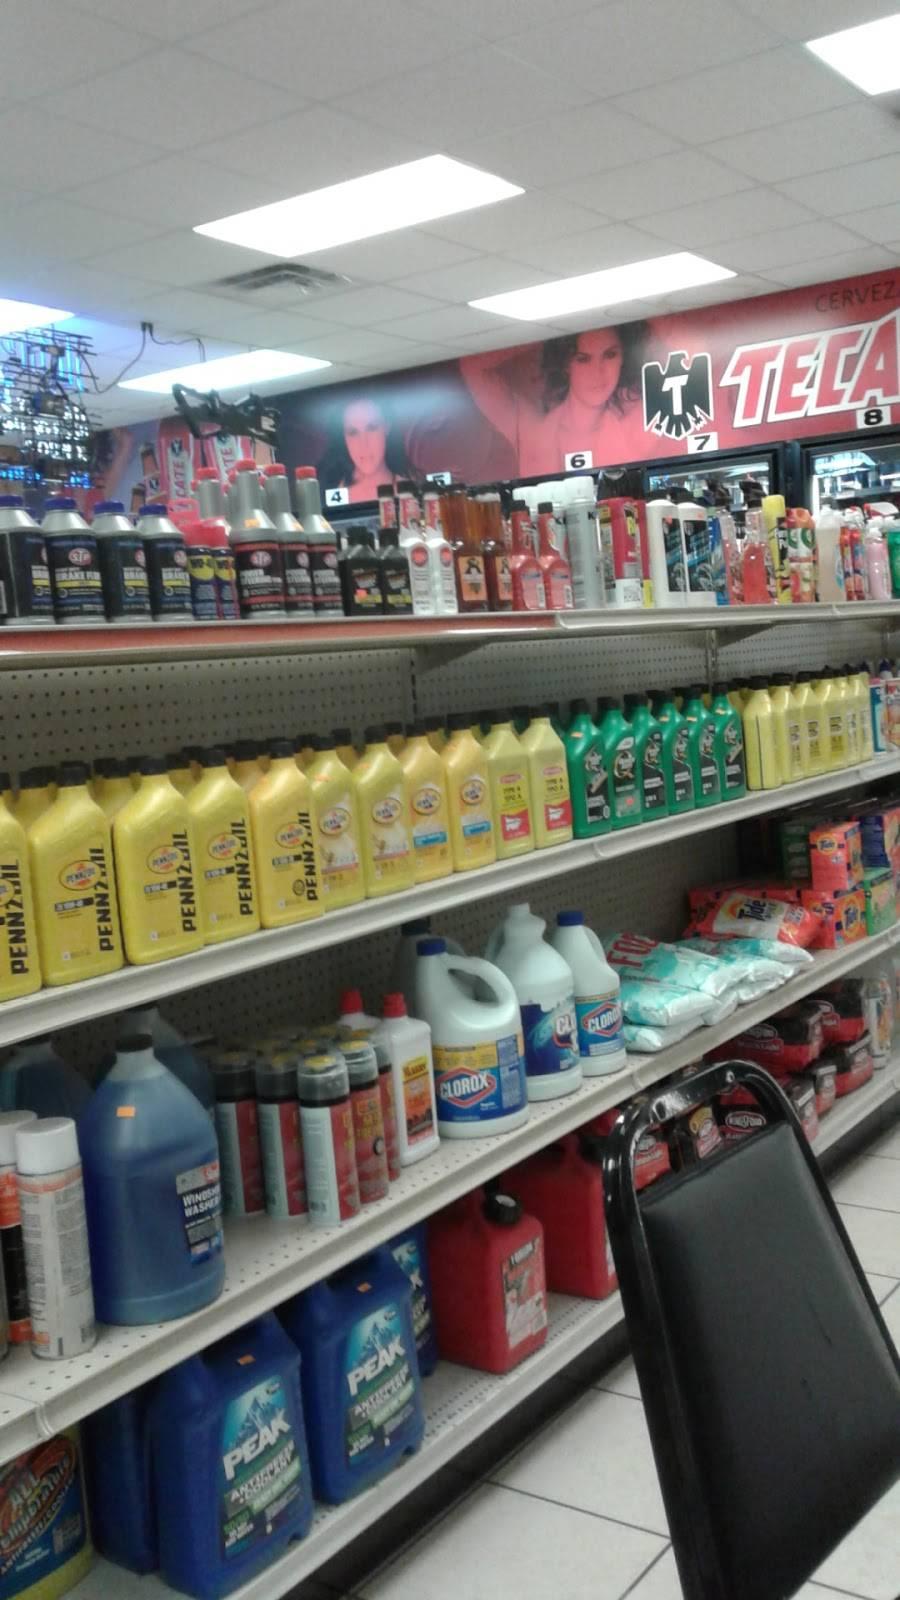 Hippo Food & Beer & Wine - store  | Photo 6 of 6 | Address: 8003 Ferguson Rd, Dallas, TX 75228, USA | Phone: (972) 803-4898